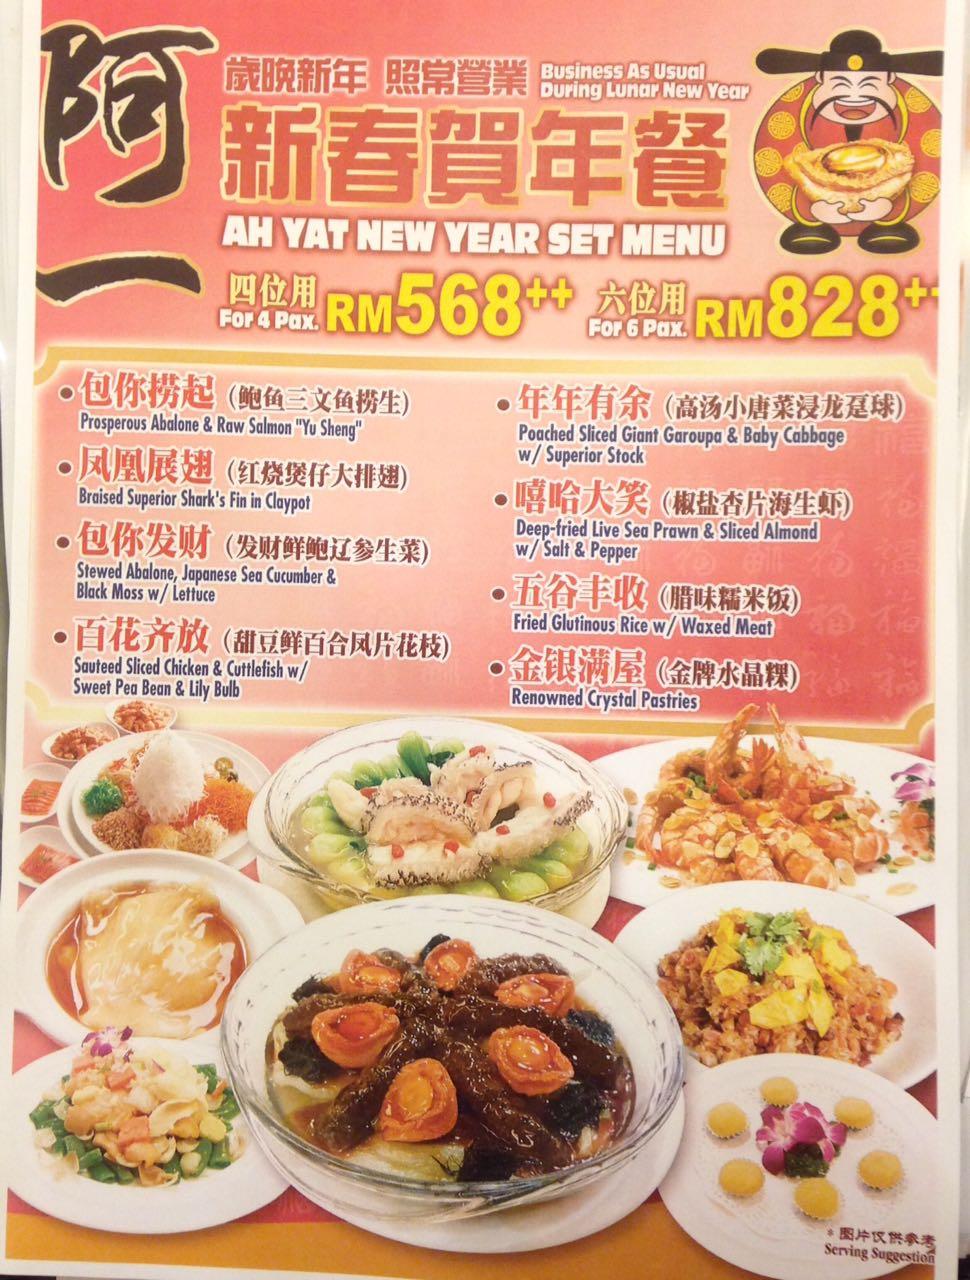 2017 chinese new year set menus of 10 restaurants in klang valley ah yat abalone - Chinese New Year Menu